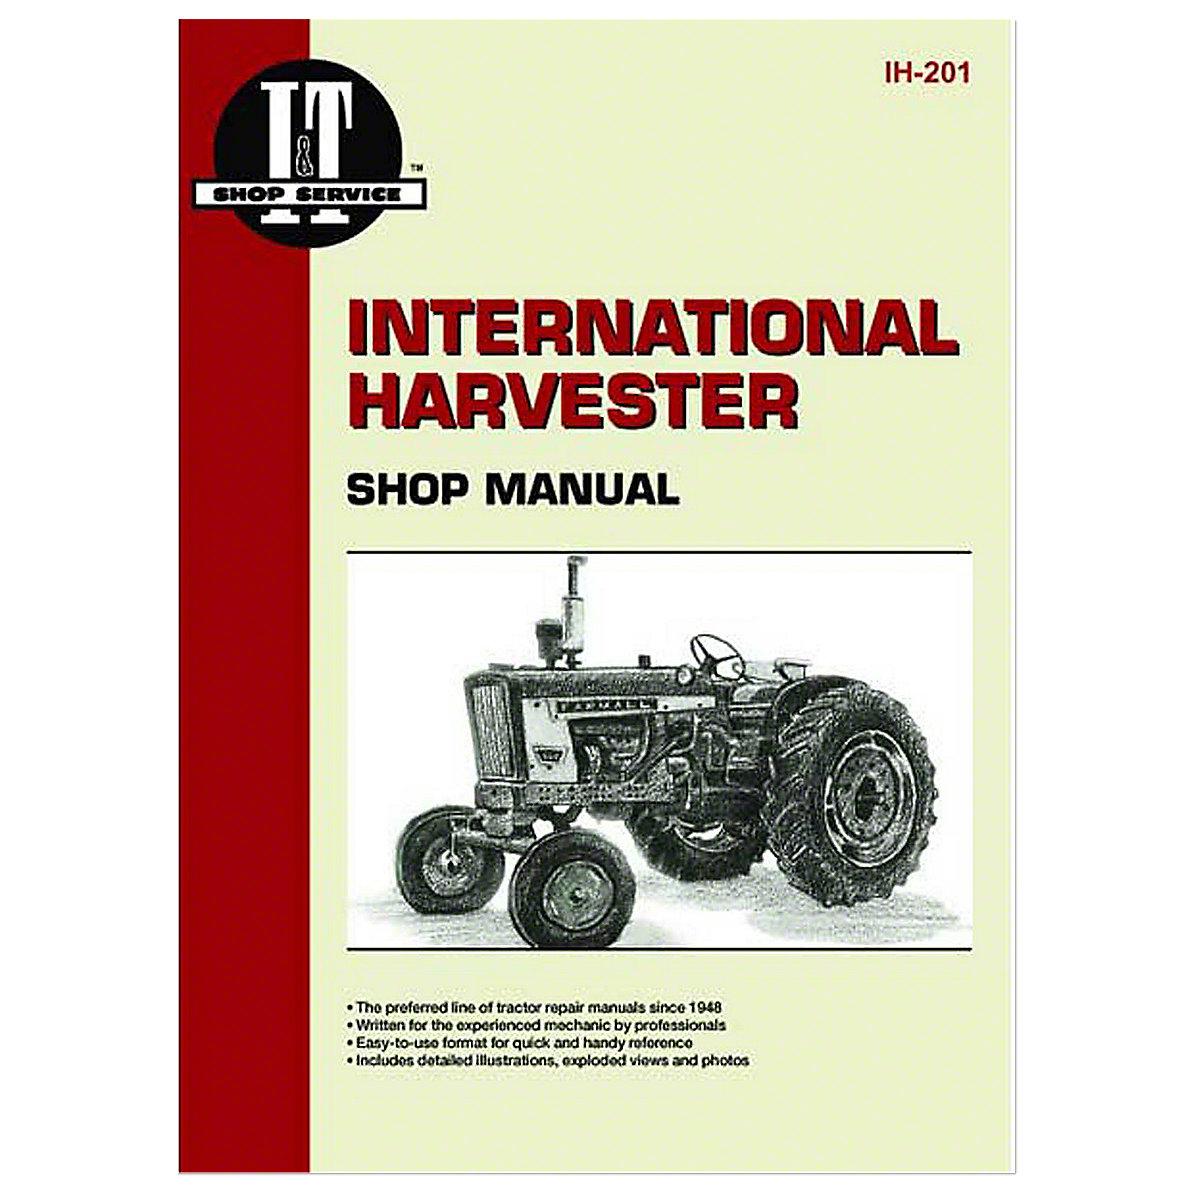 ih201 i t shop service manual rh steinertractor com International Harvester Tractor 2440 364 International Tractor Model